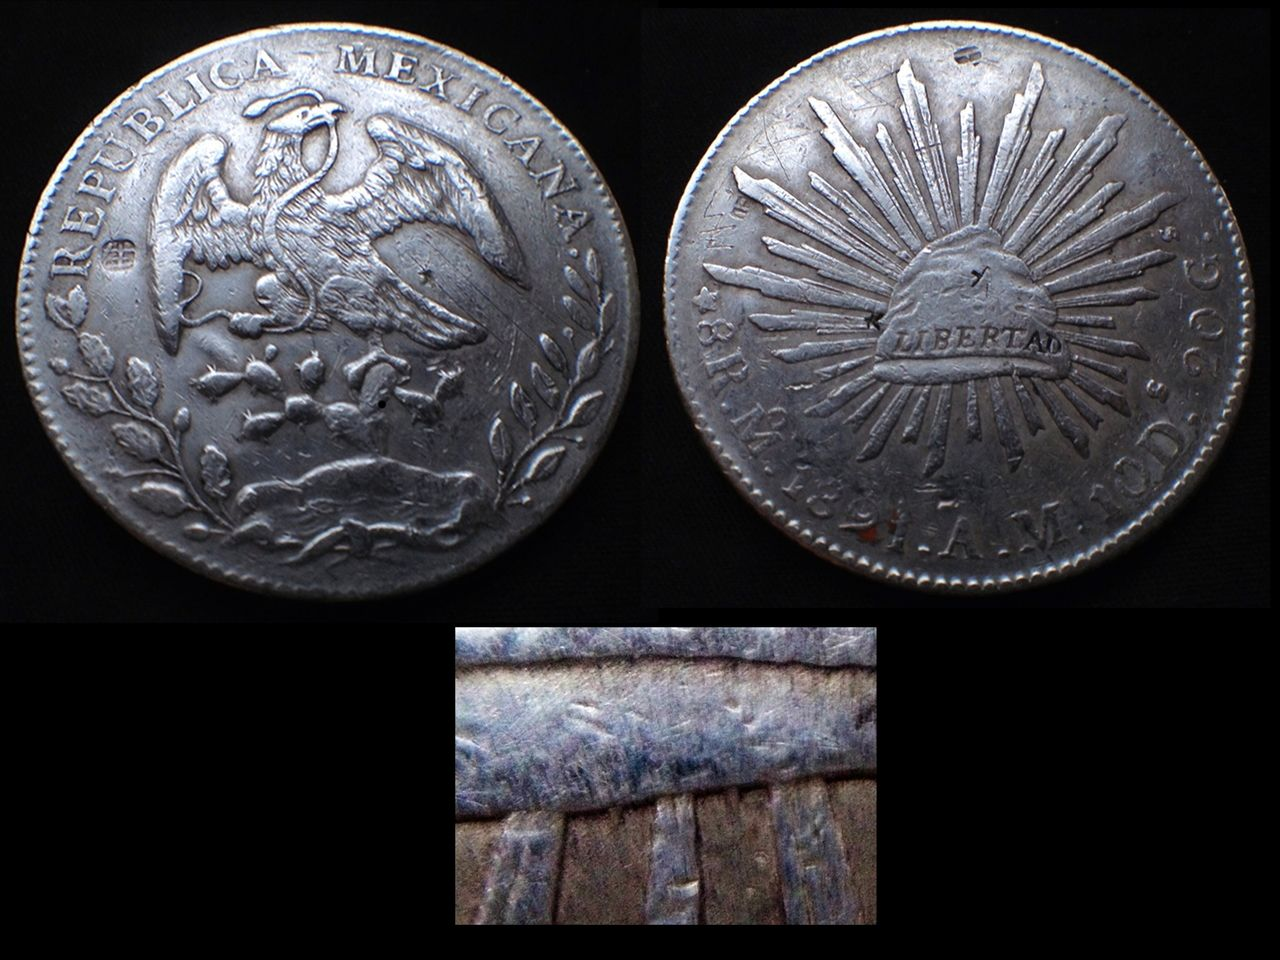 8 reales 1891 México- Resellos 8_reales_1891_M_xico_resellos